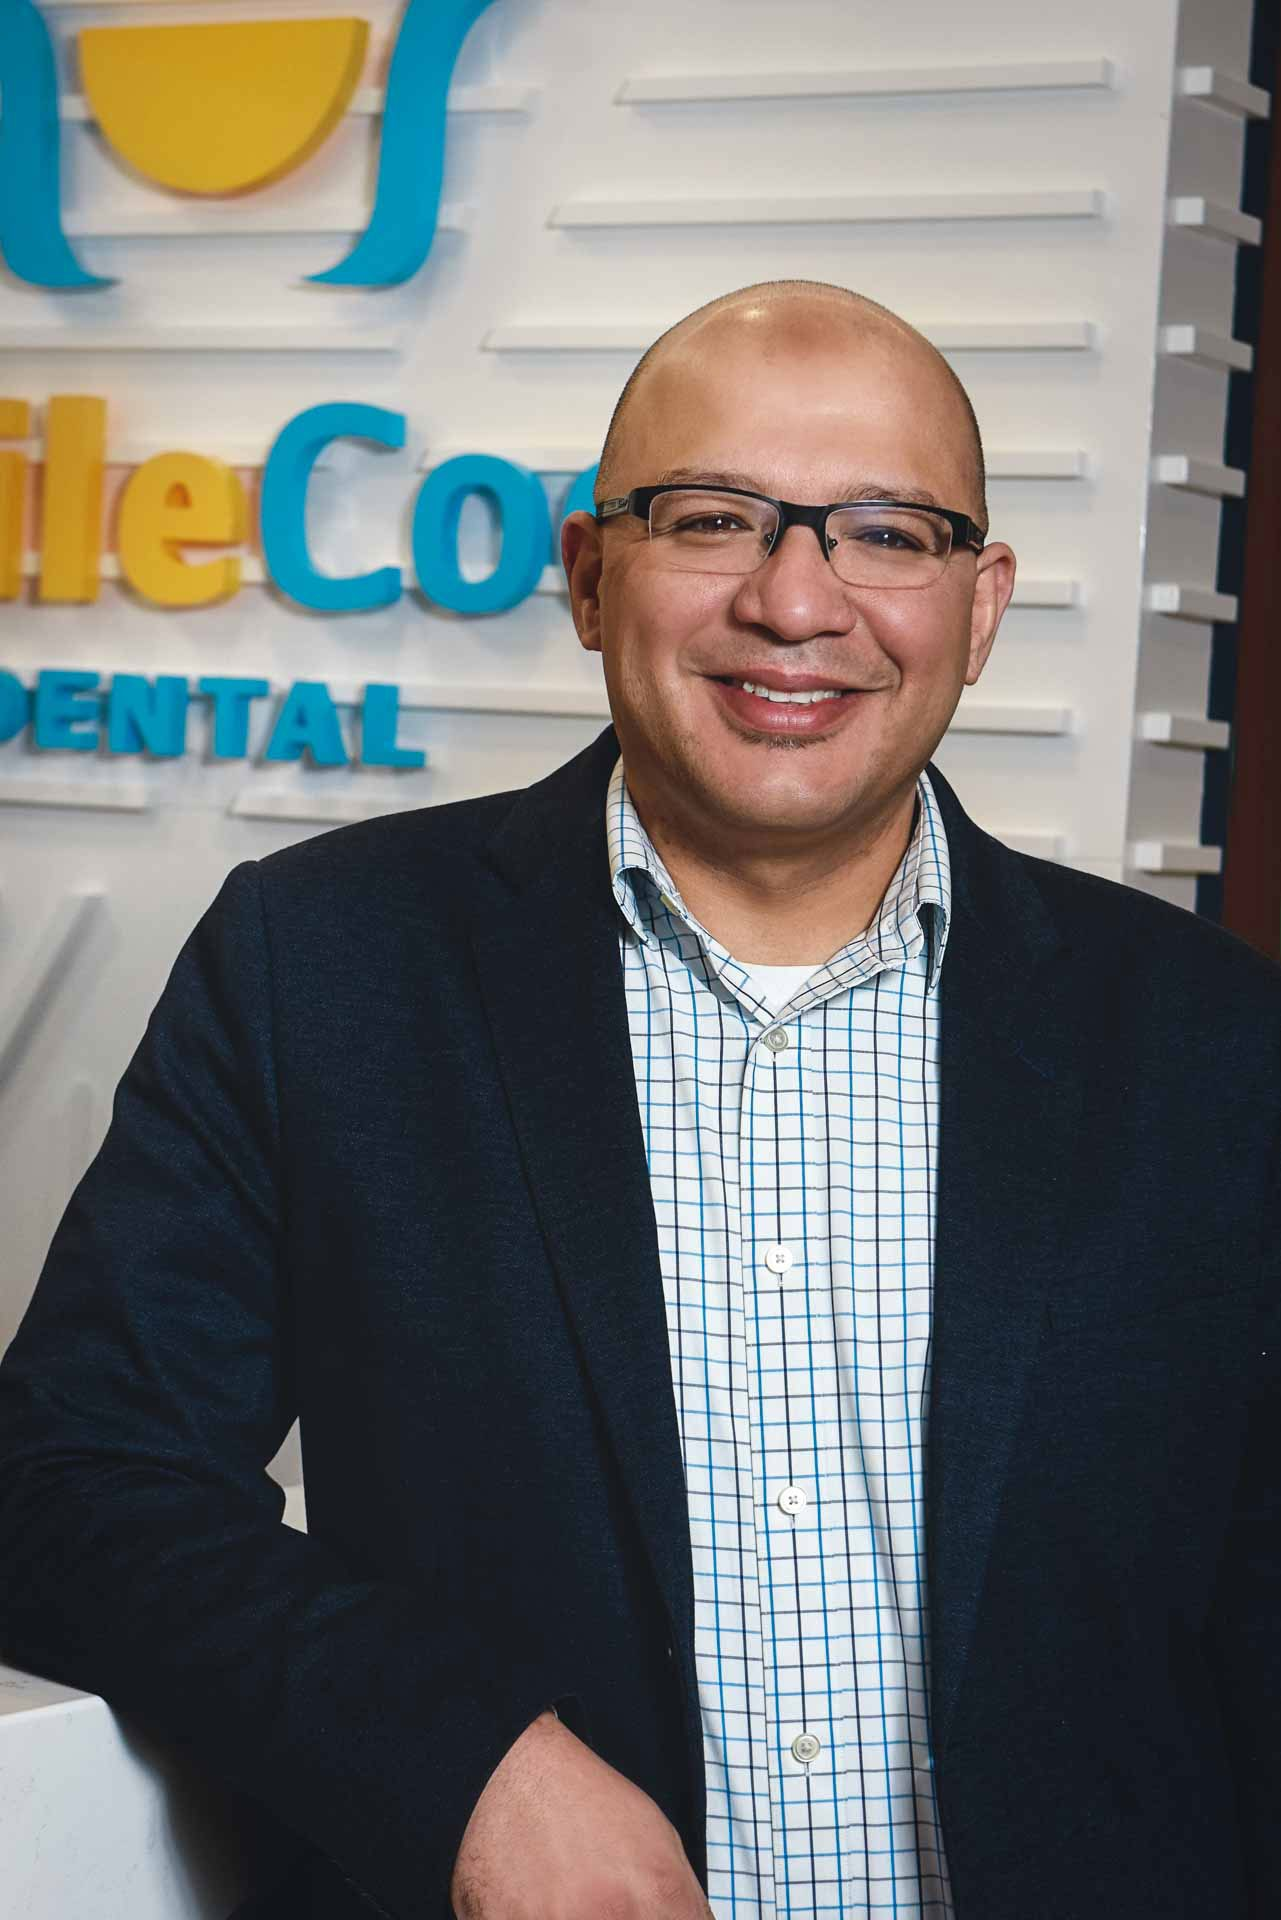 Dr. Mohamed El Gamal | SmileCode Dental | NW Calgary | General Dentist